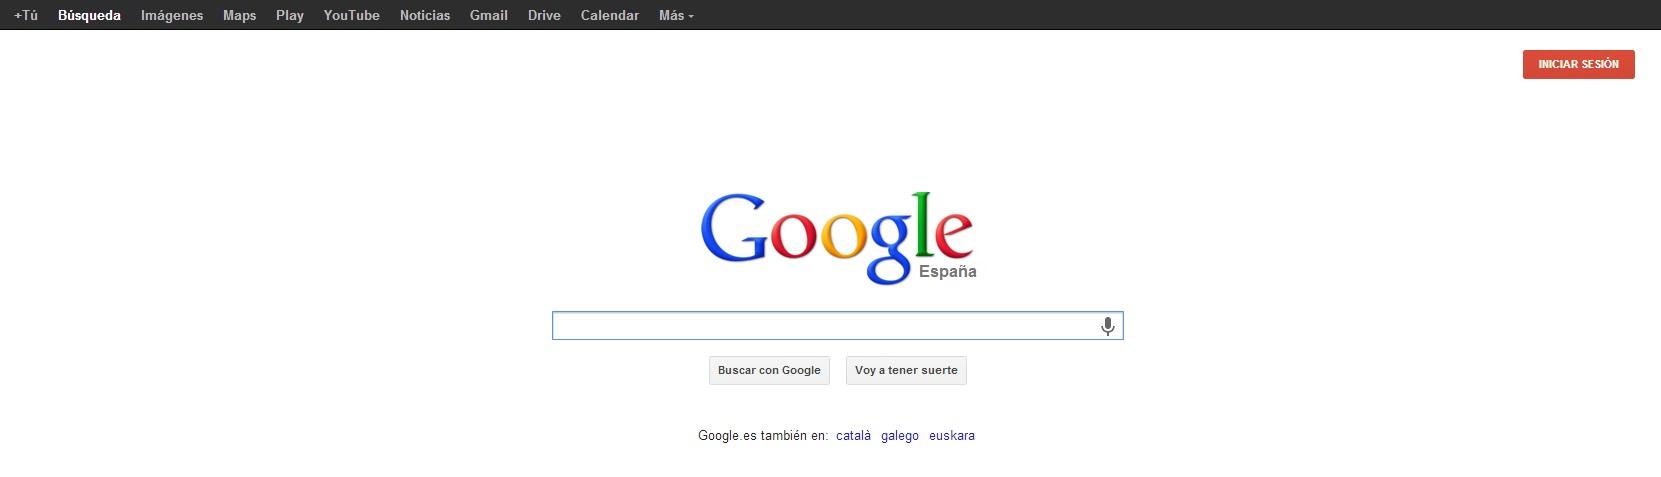 Google diseño anterior